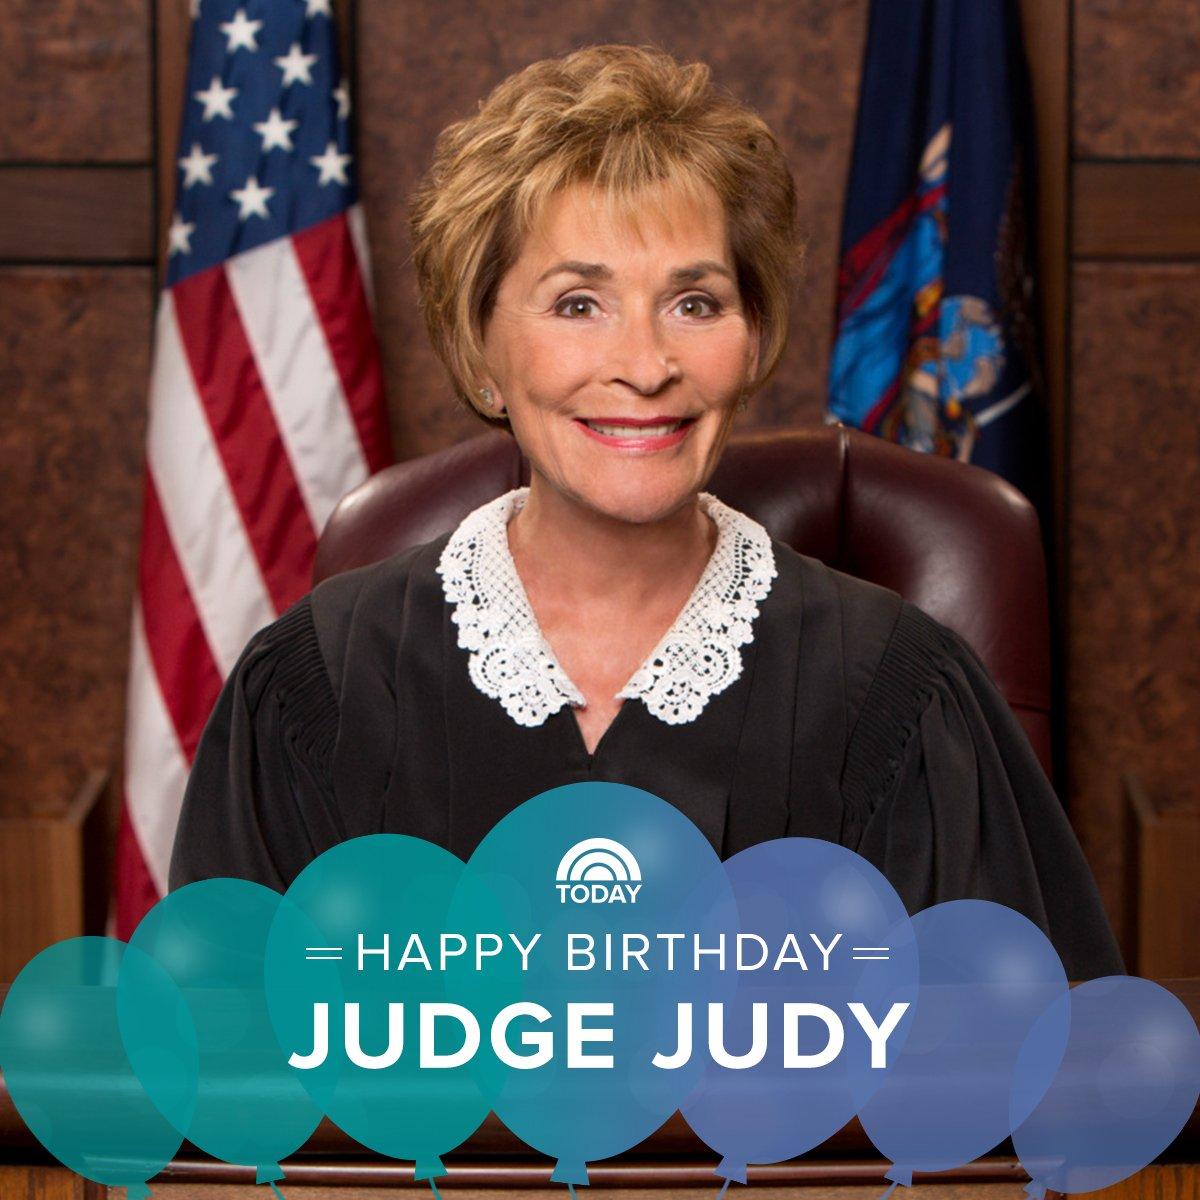 Happy birthday, @JudgeJudy!